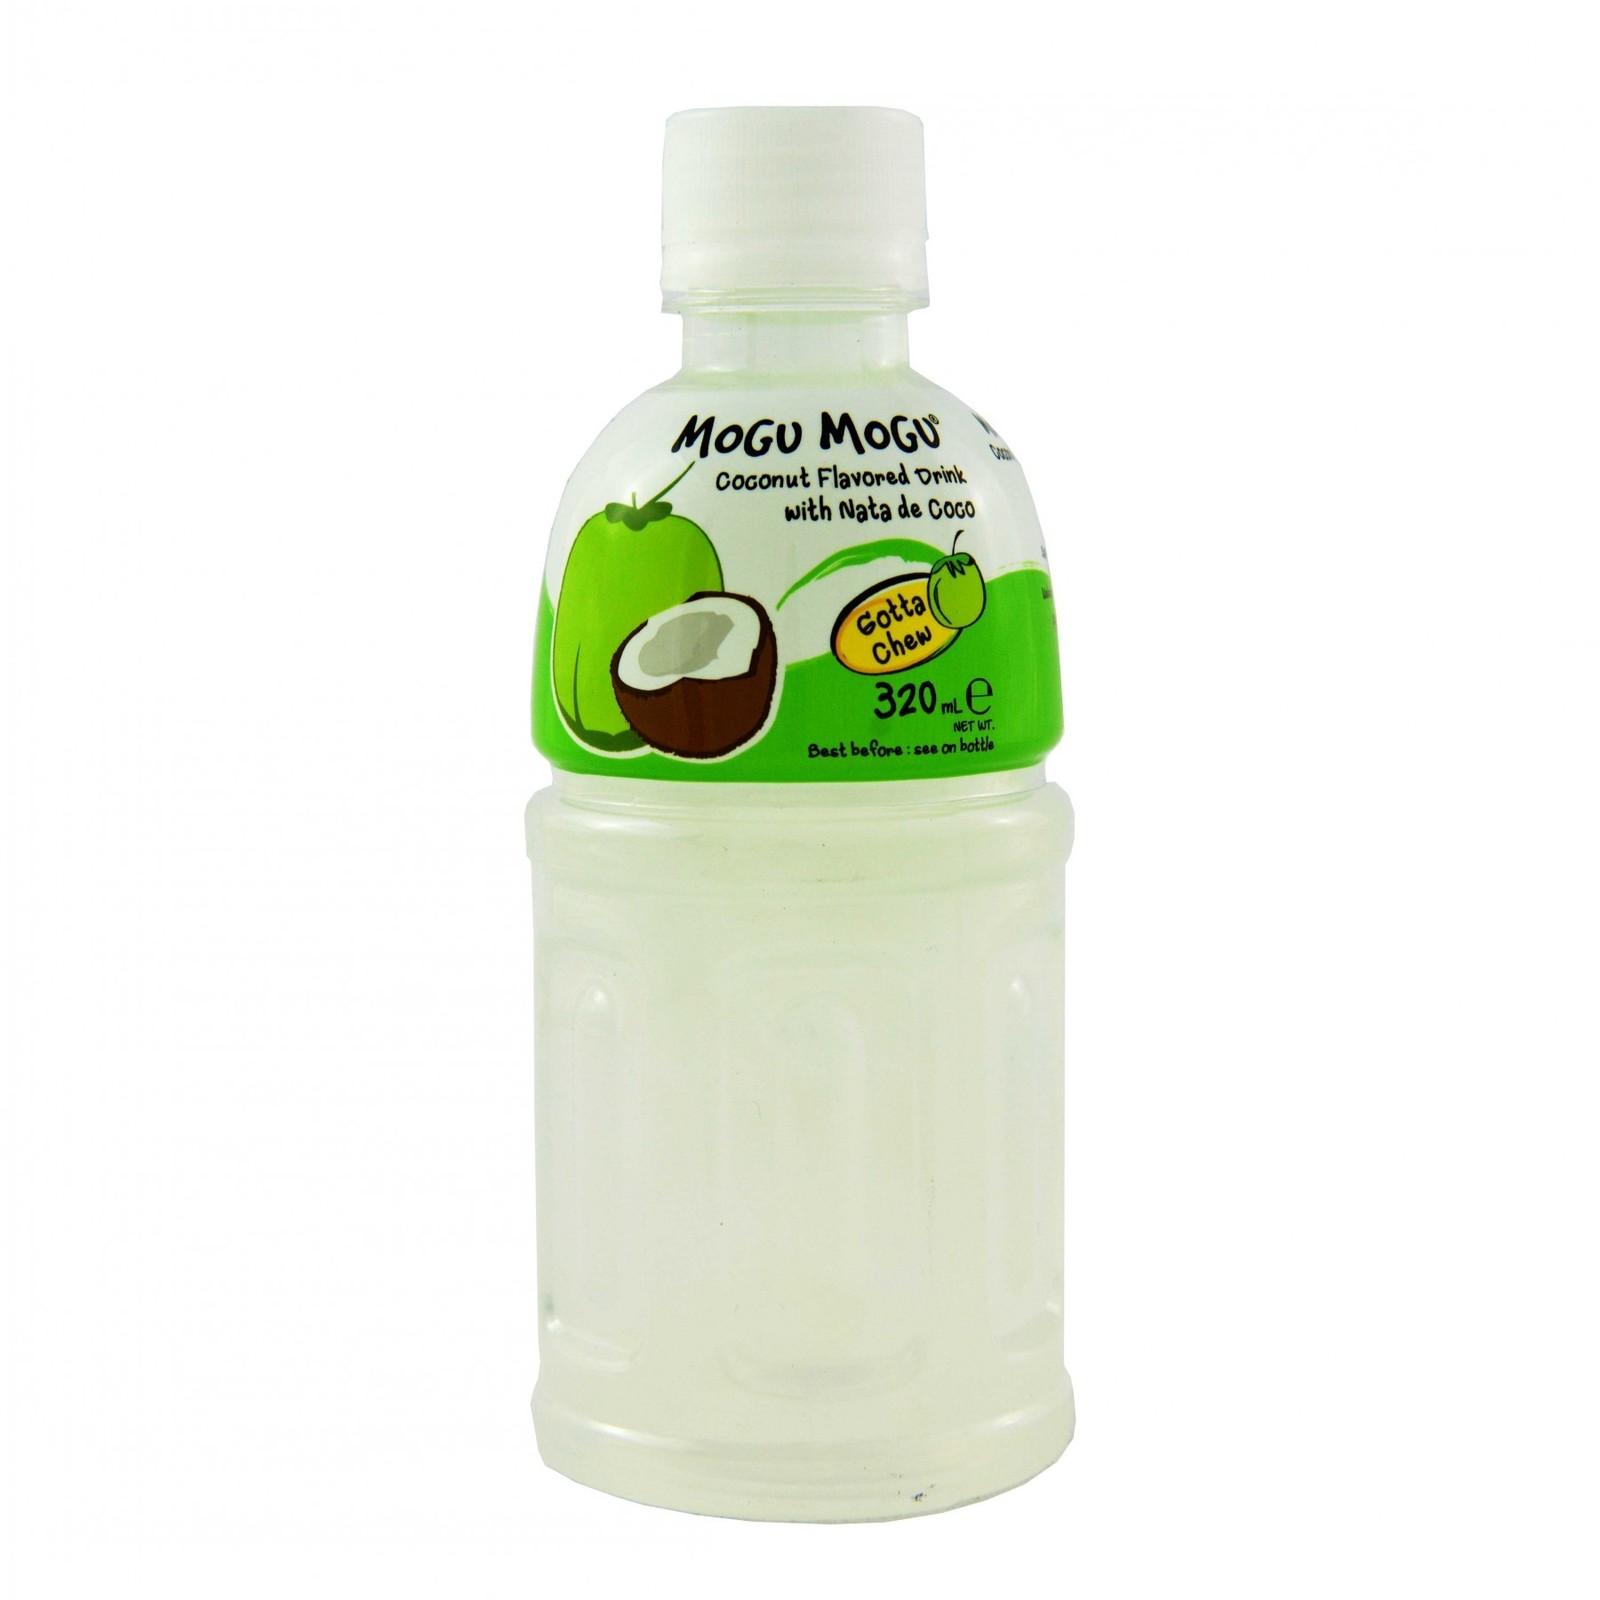 Mogu Mogu Coconut Flavored Drink 320ml image